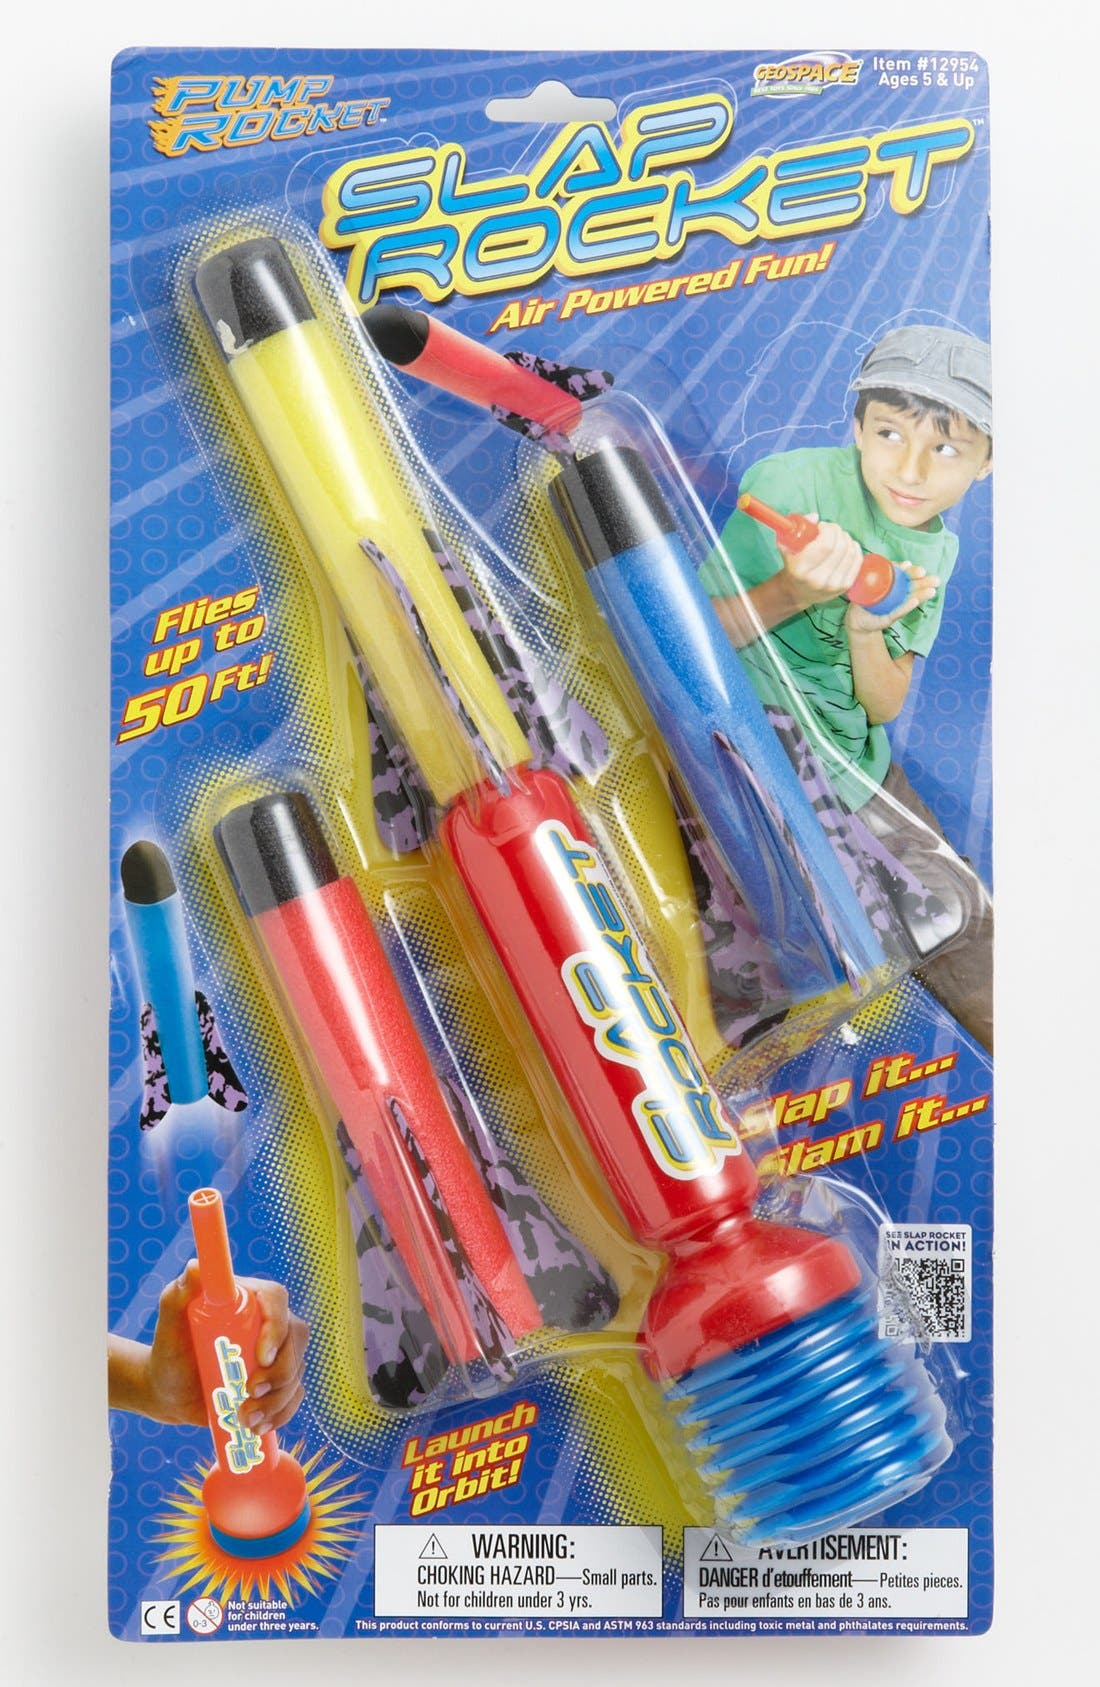 Alternate Image 1 Selected - Geospace International Toys Slap Rocket